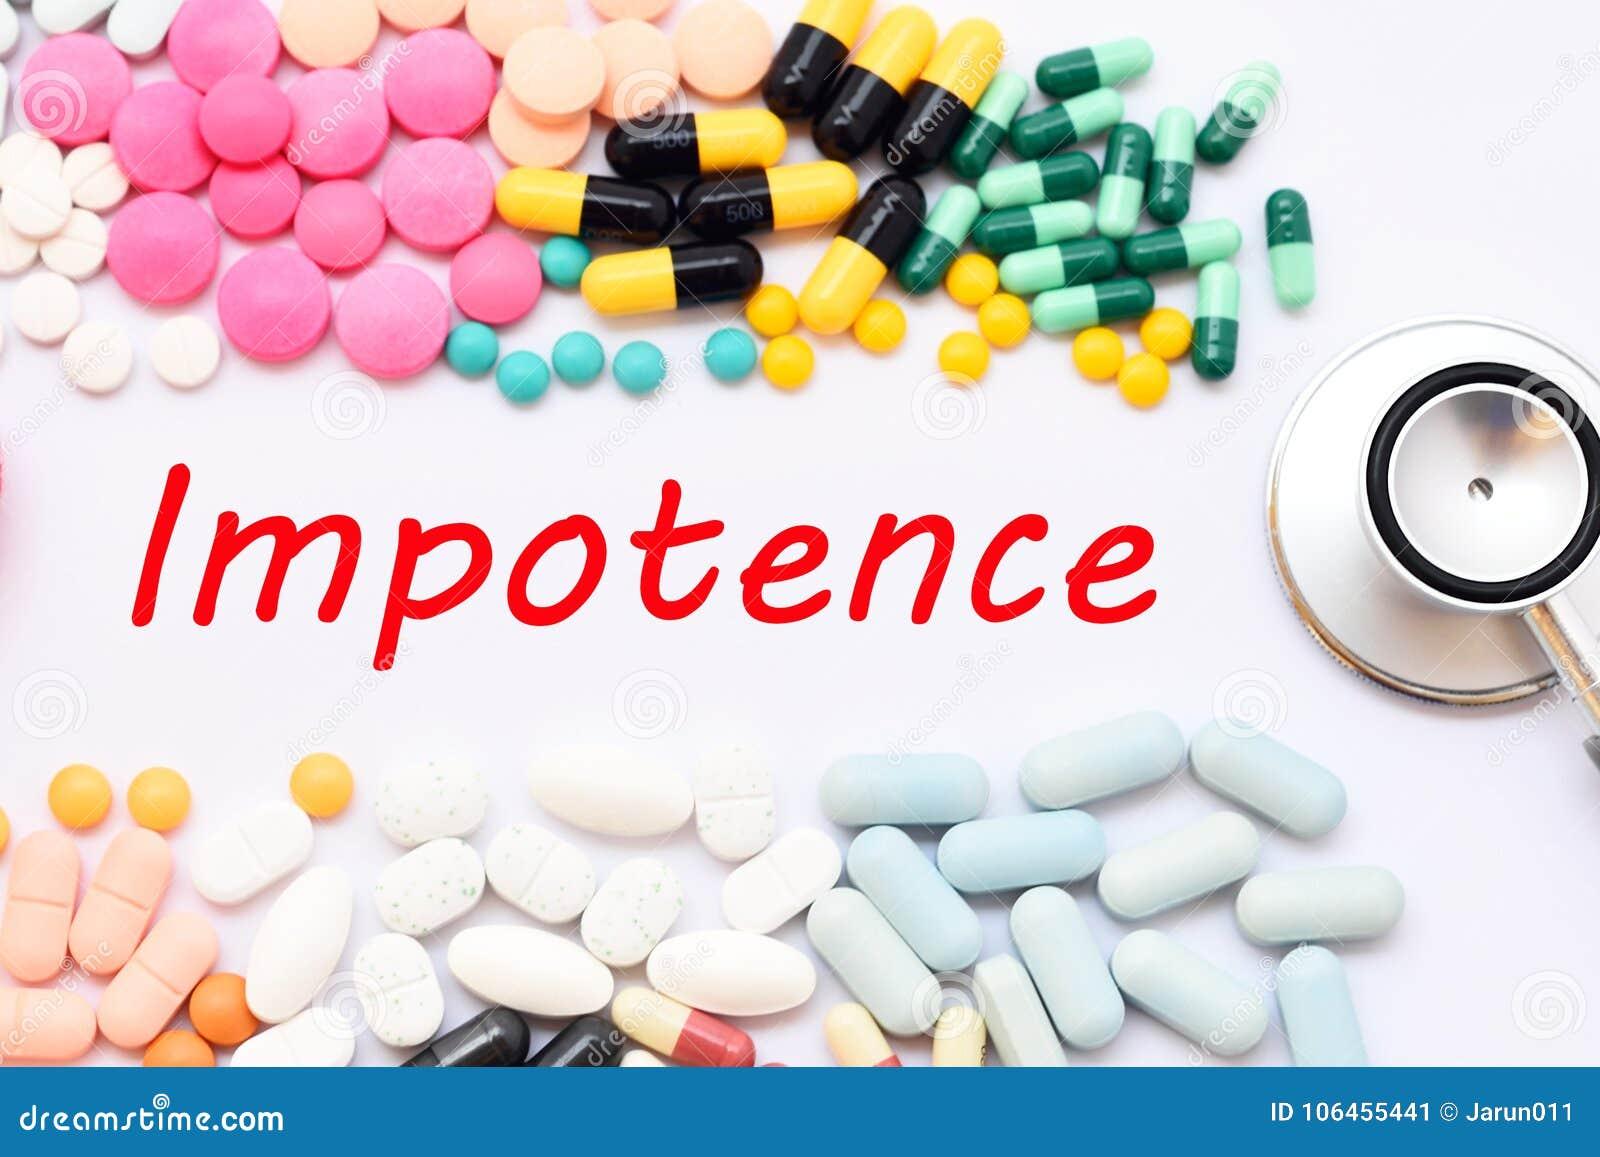 Impotence treatment